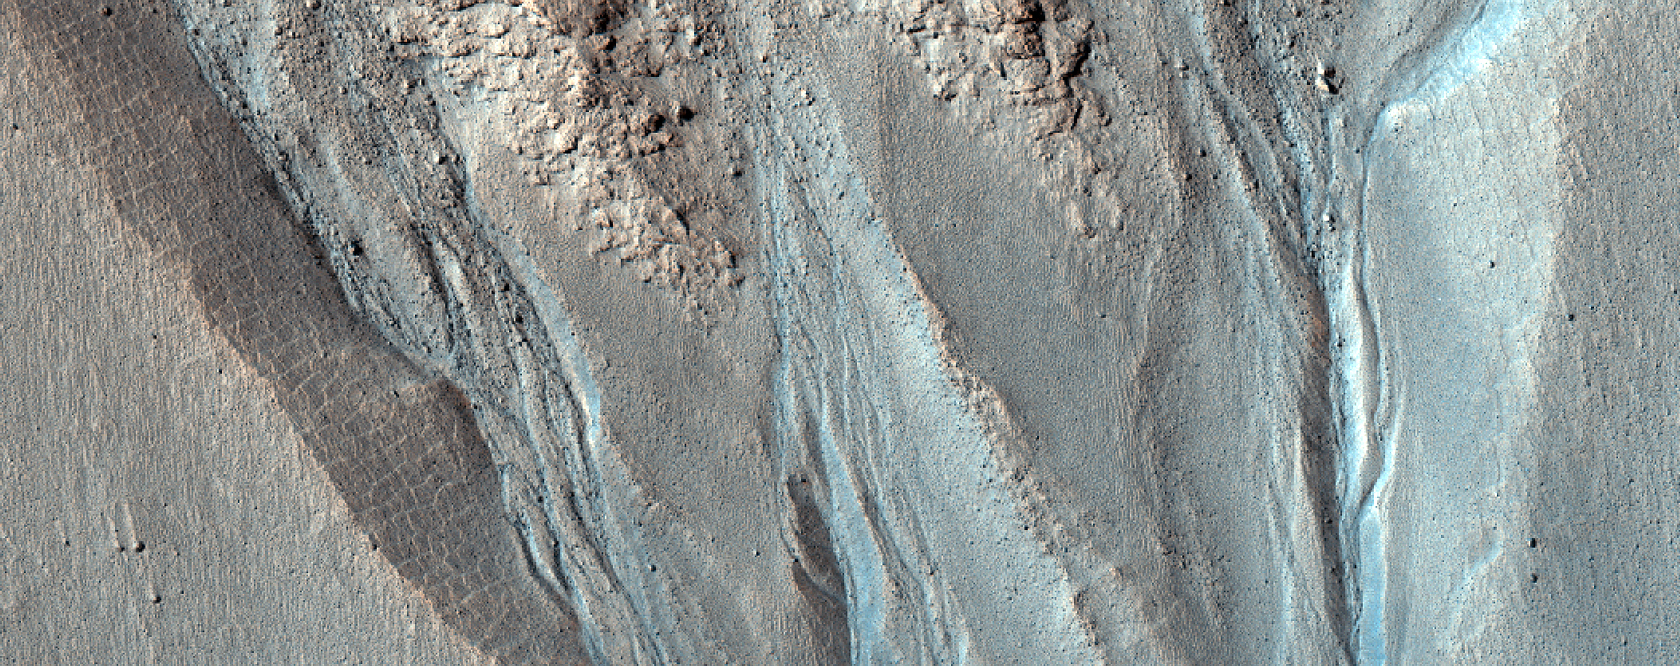 Gully Monitoring in Terra Sirenum